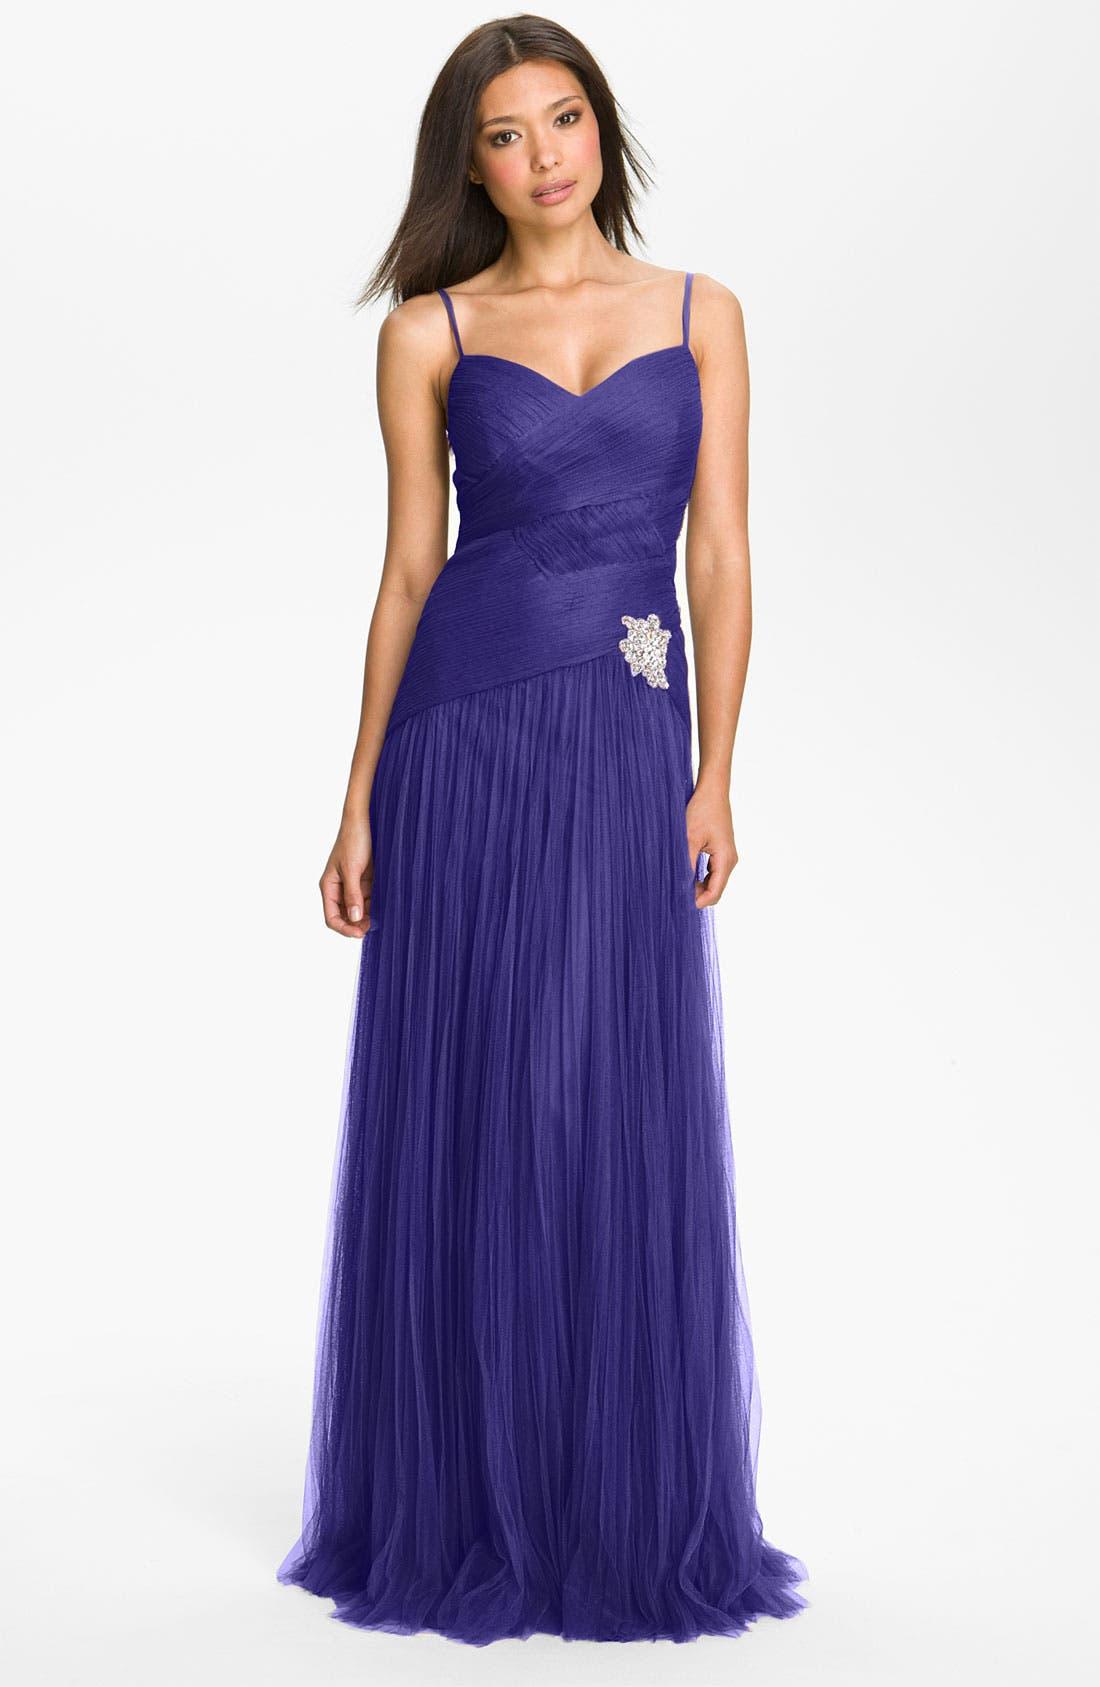 Main Image - Veni Infantino Textured Drop Waist Tulle Gown & Shrug